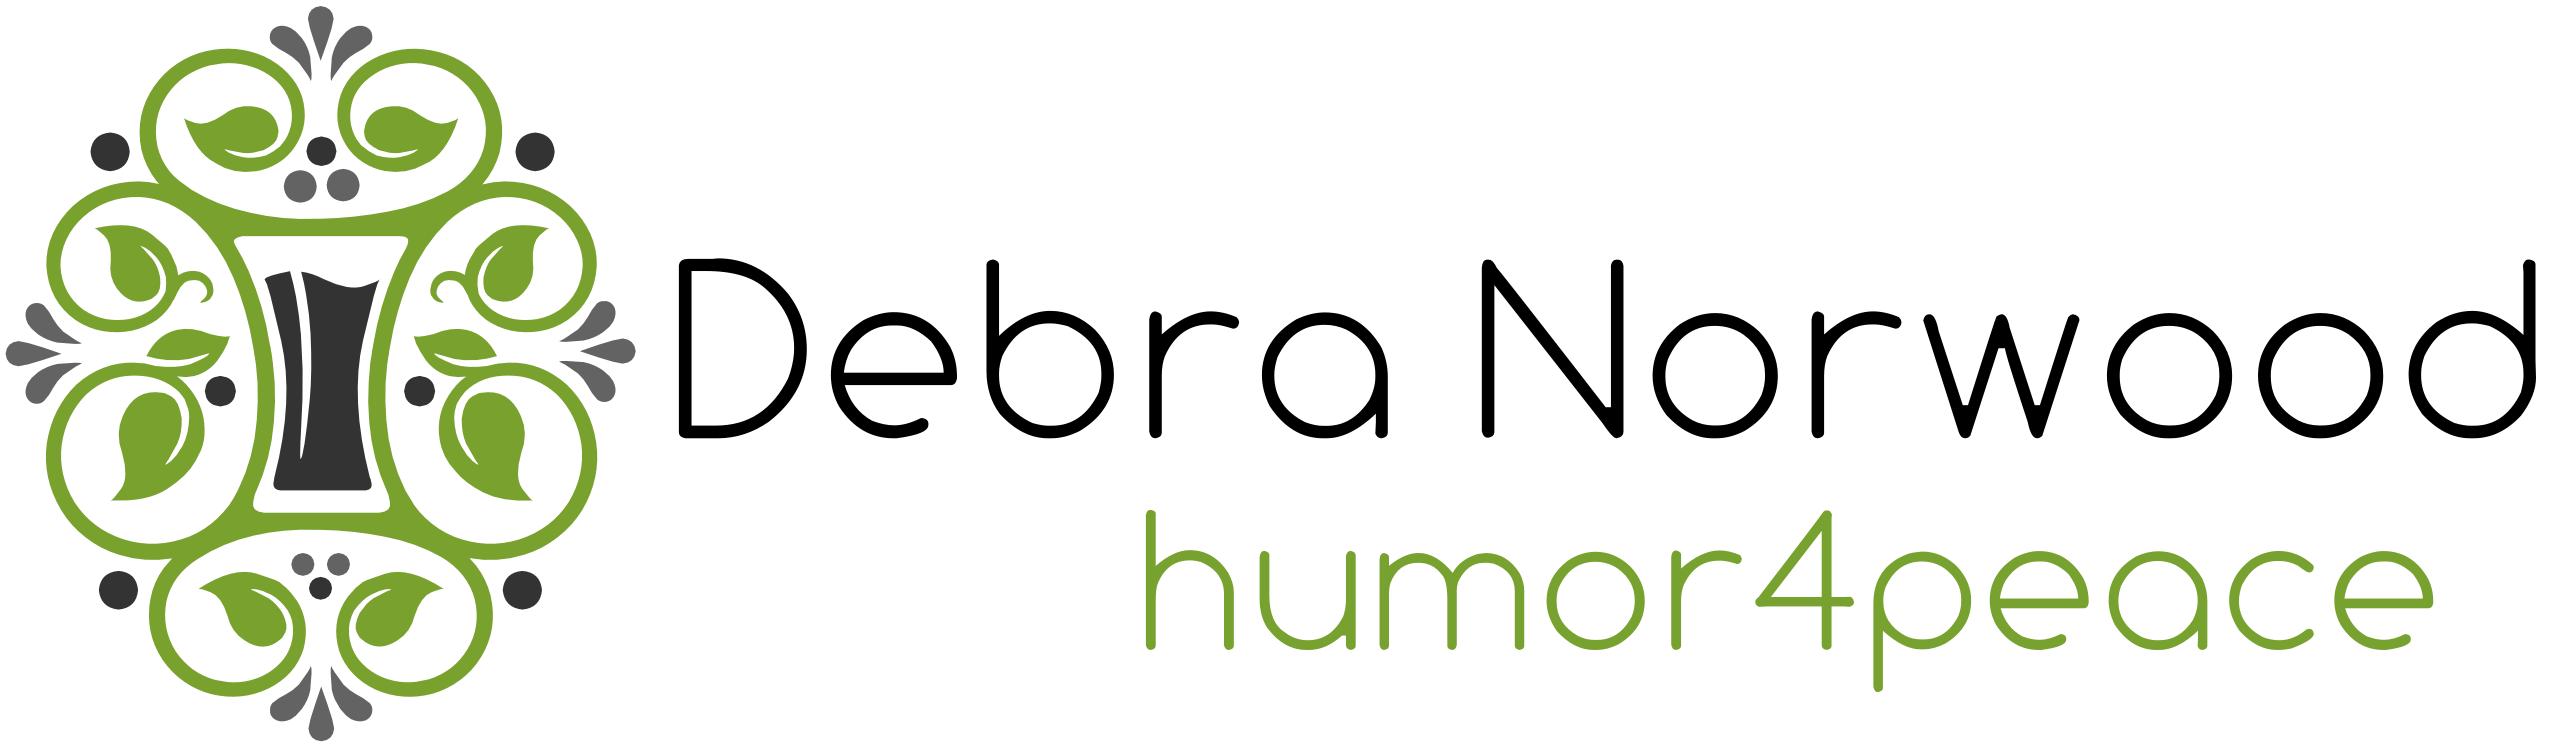 Debra Norwood